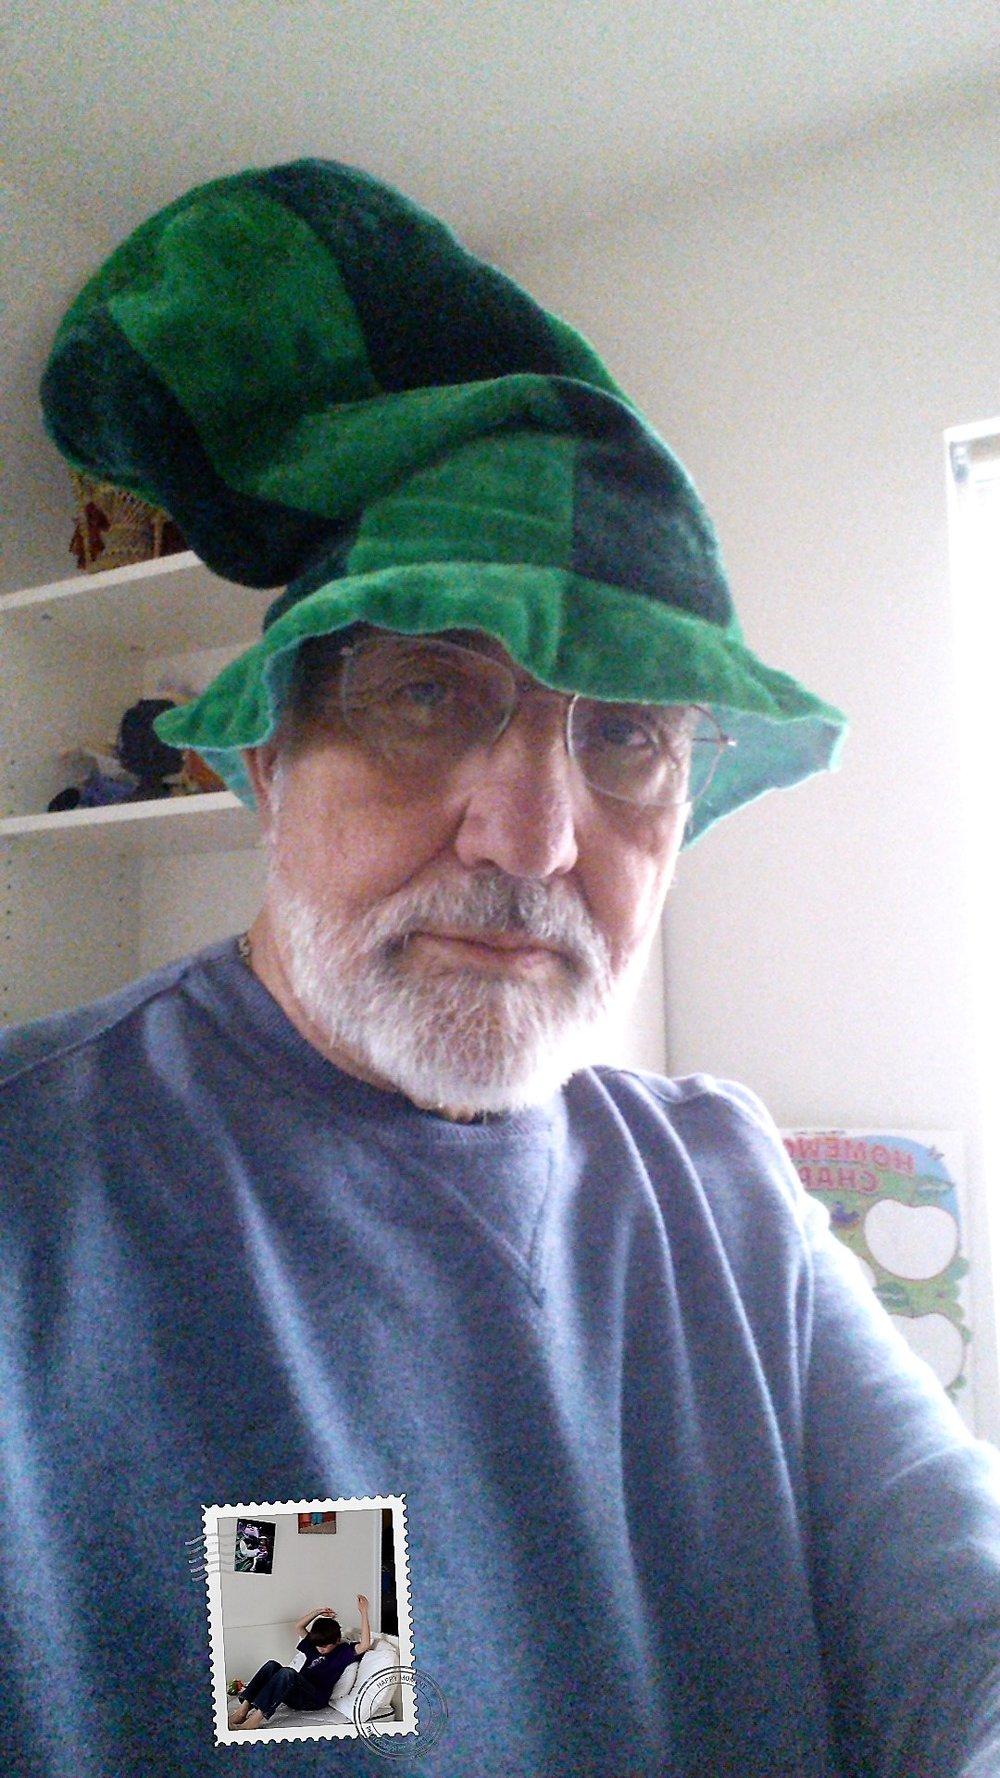 Rob funny hat.jpg